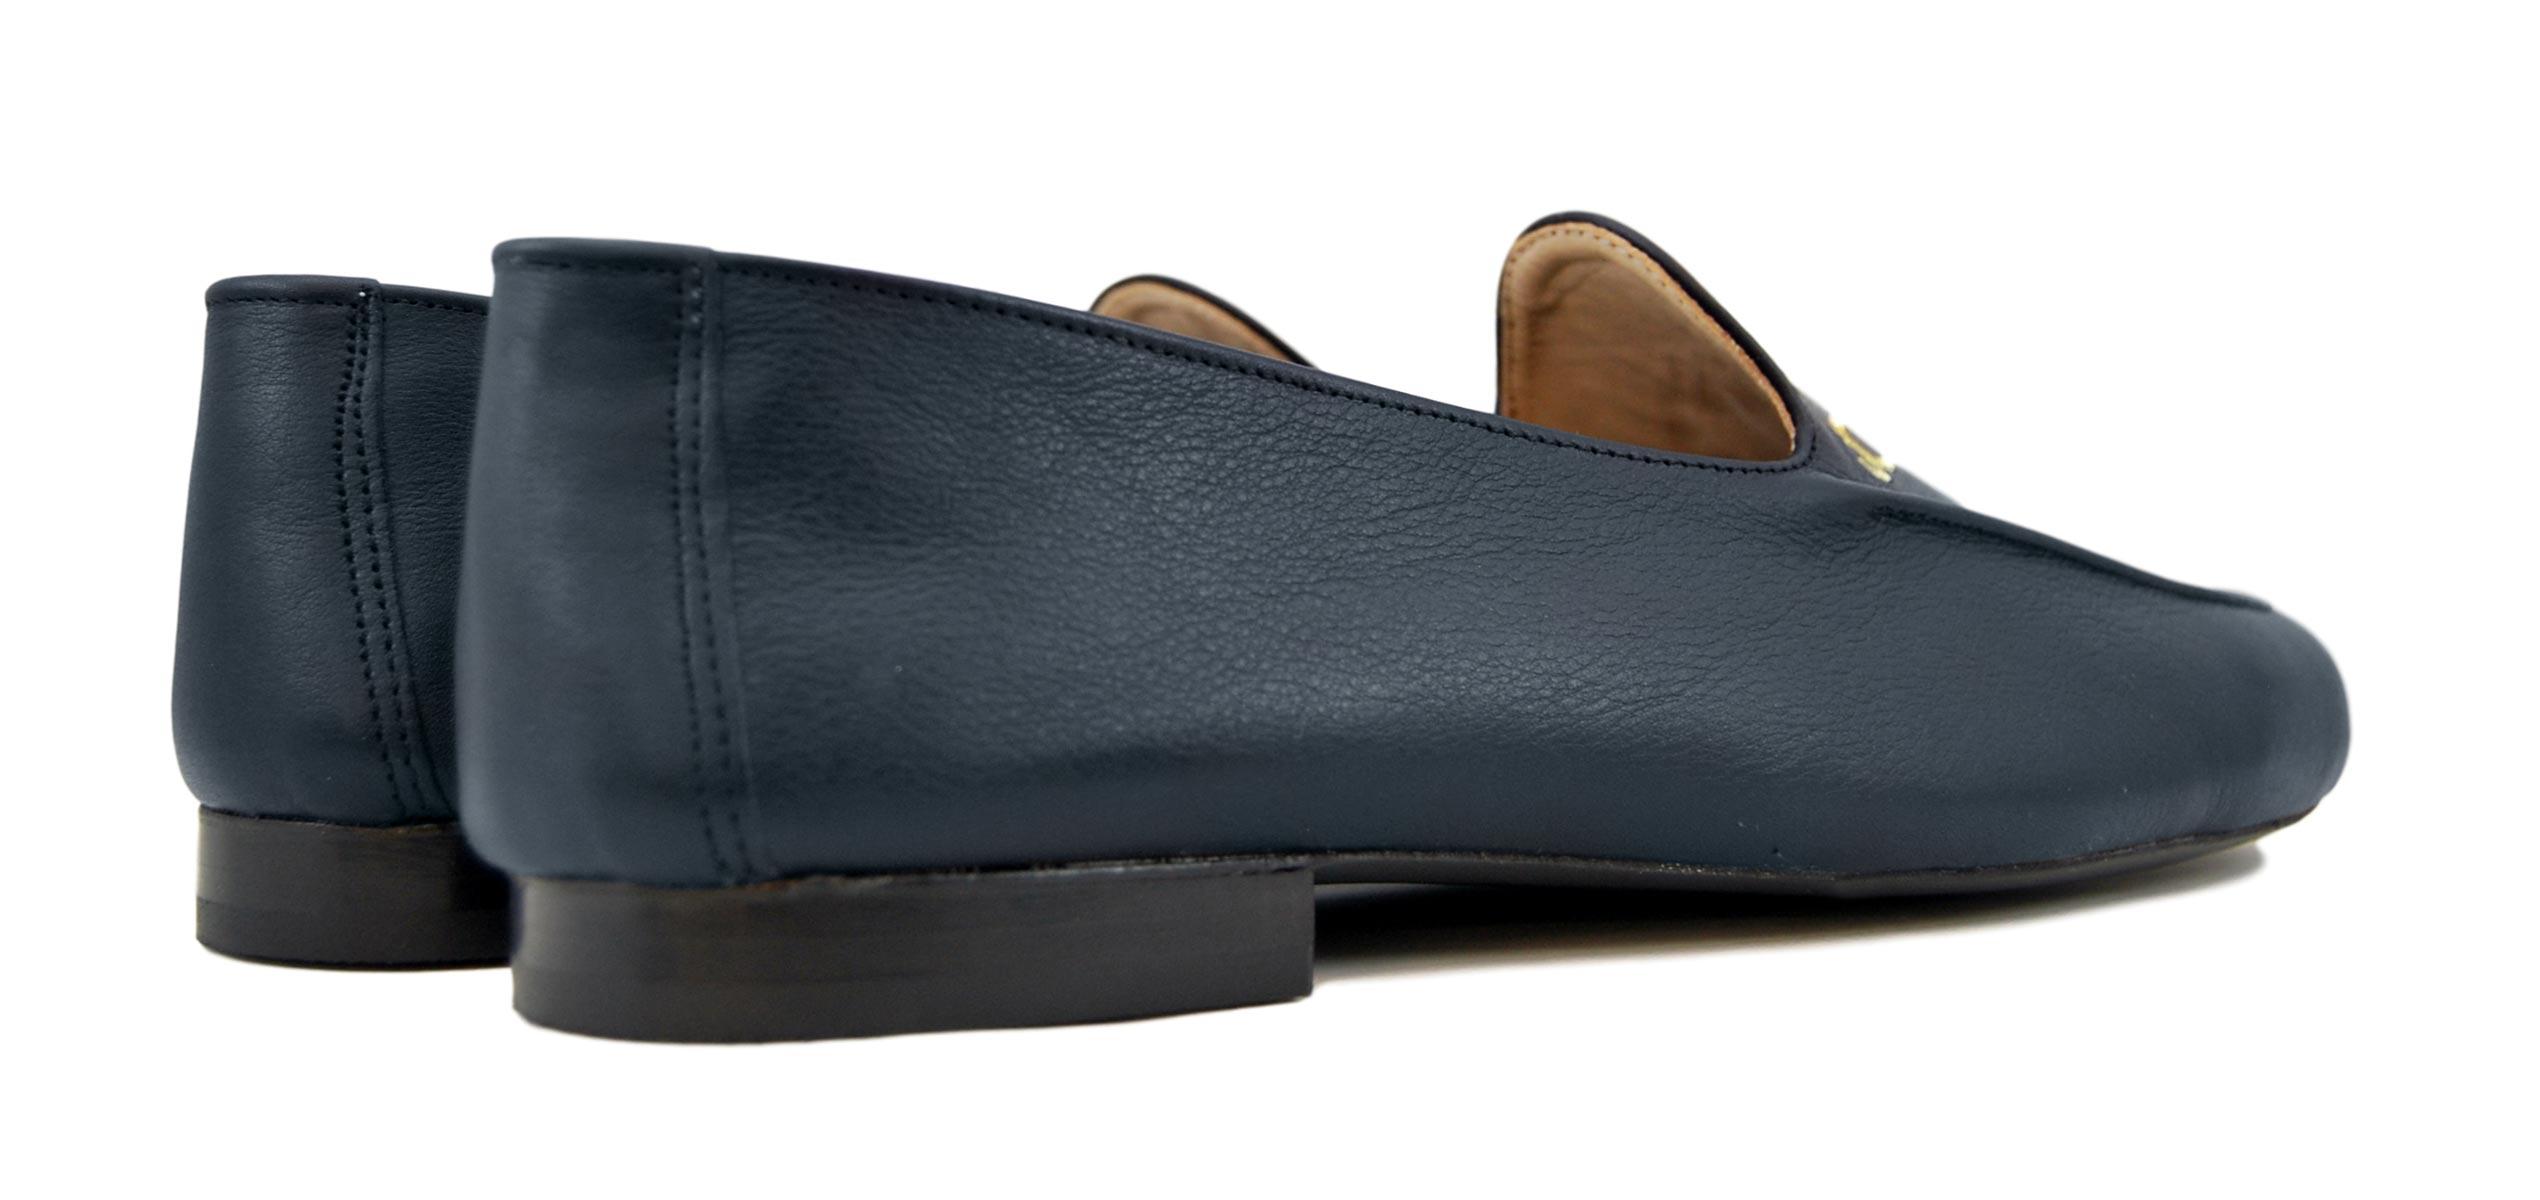 Foto 4 de Zapatos Julio Iglesias Mocasin 528 JC Marino Napa